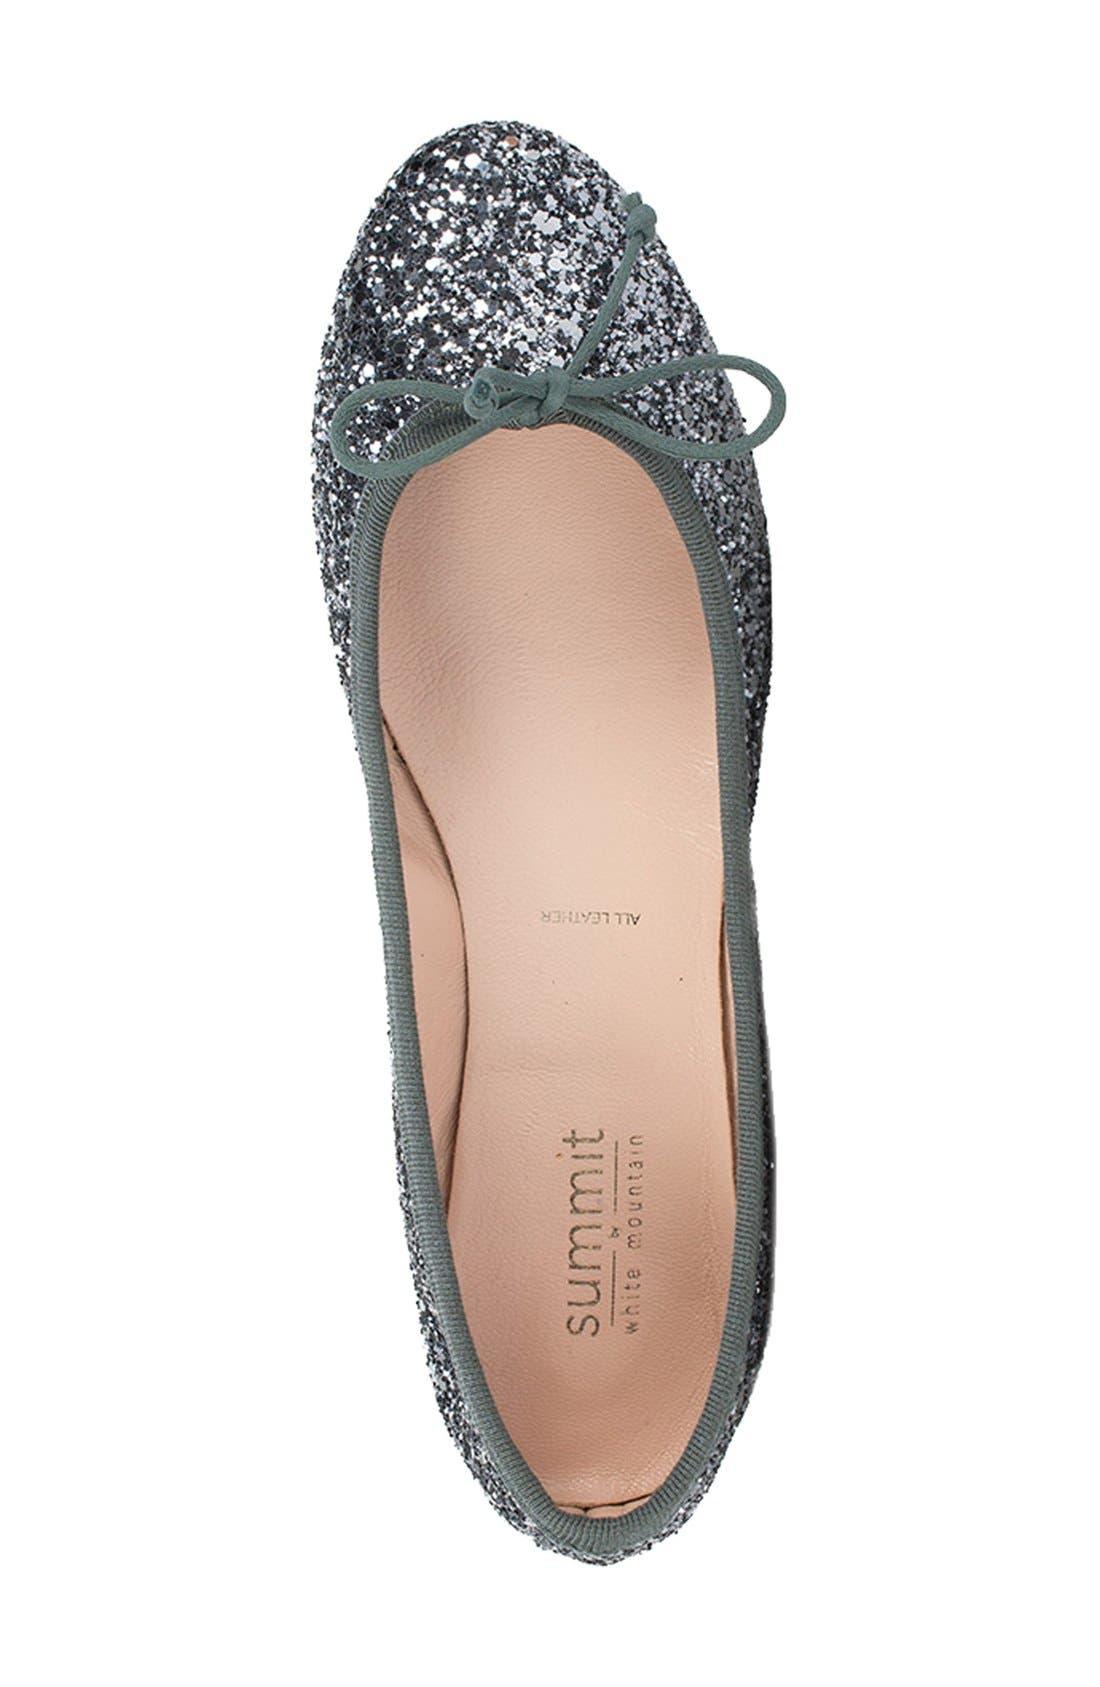 Summit 'Kendall' Ballet Flat,                             Alternate thumbnail 33, color,